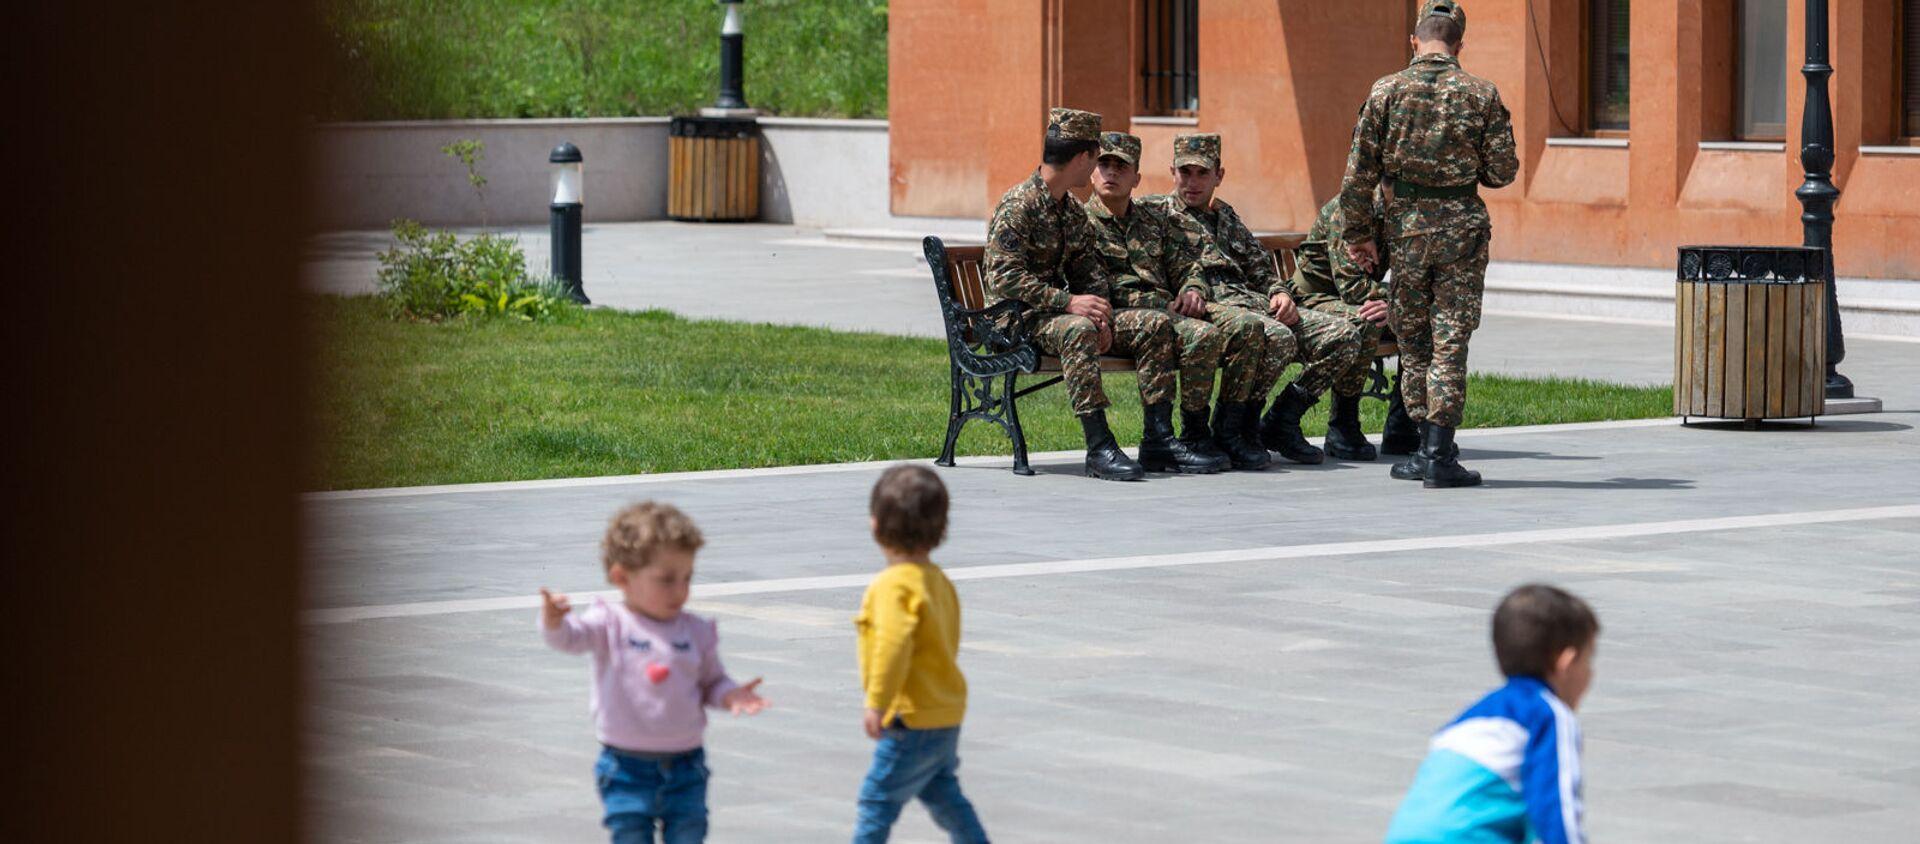 Дети и военнослужащие в сквере в Степанакерте - Sputnik Արմենիա, 1920, 24.07.2021